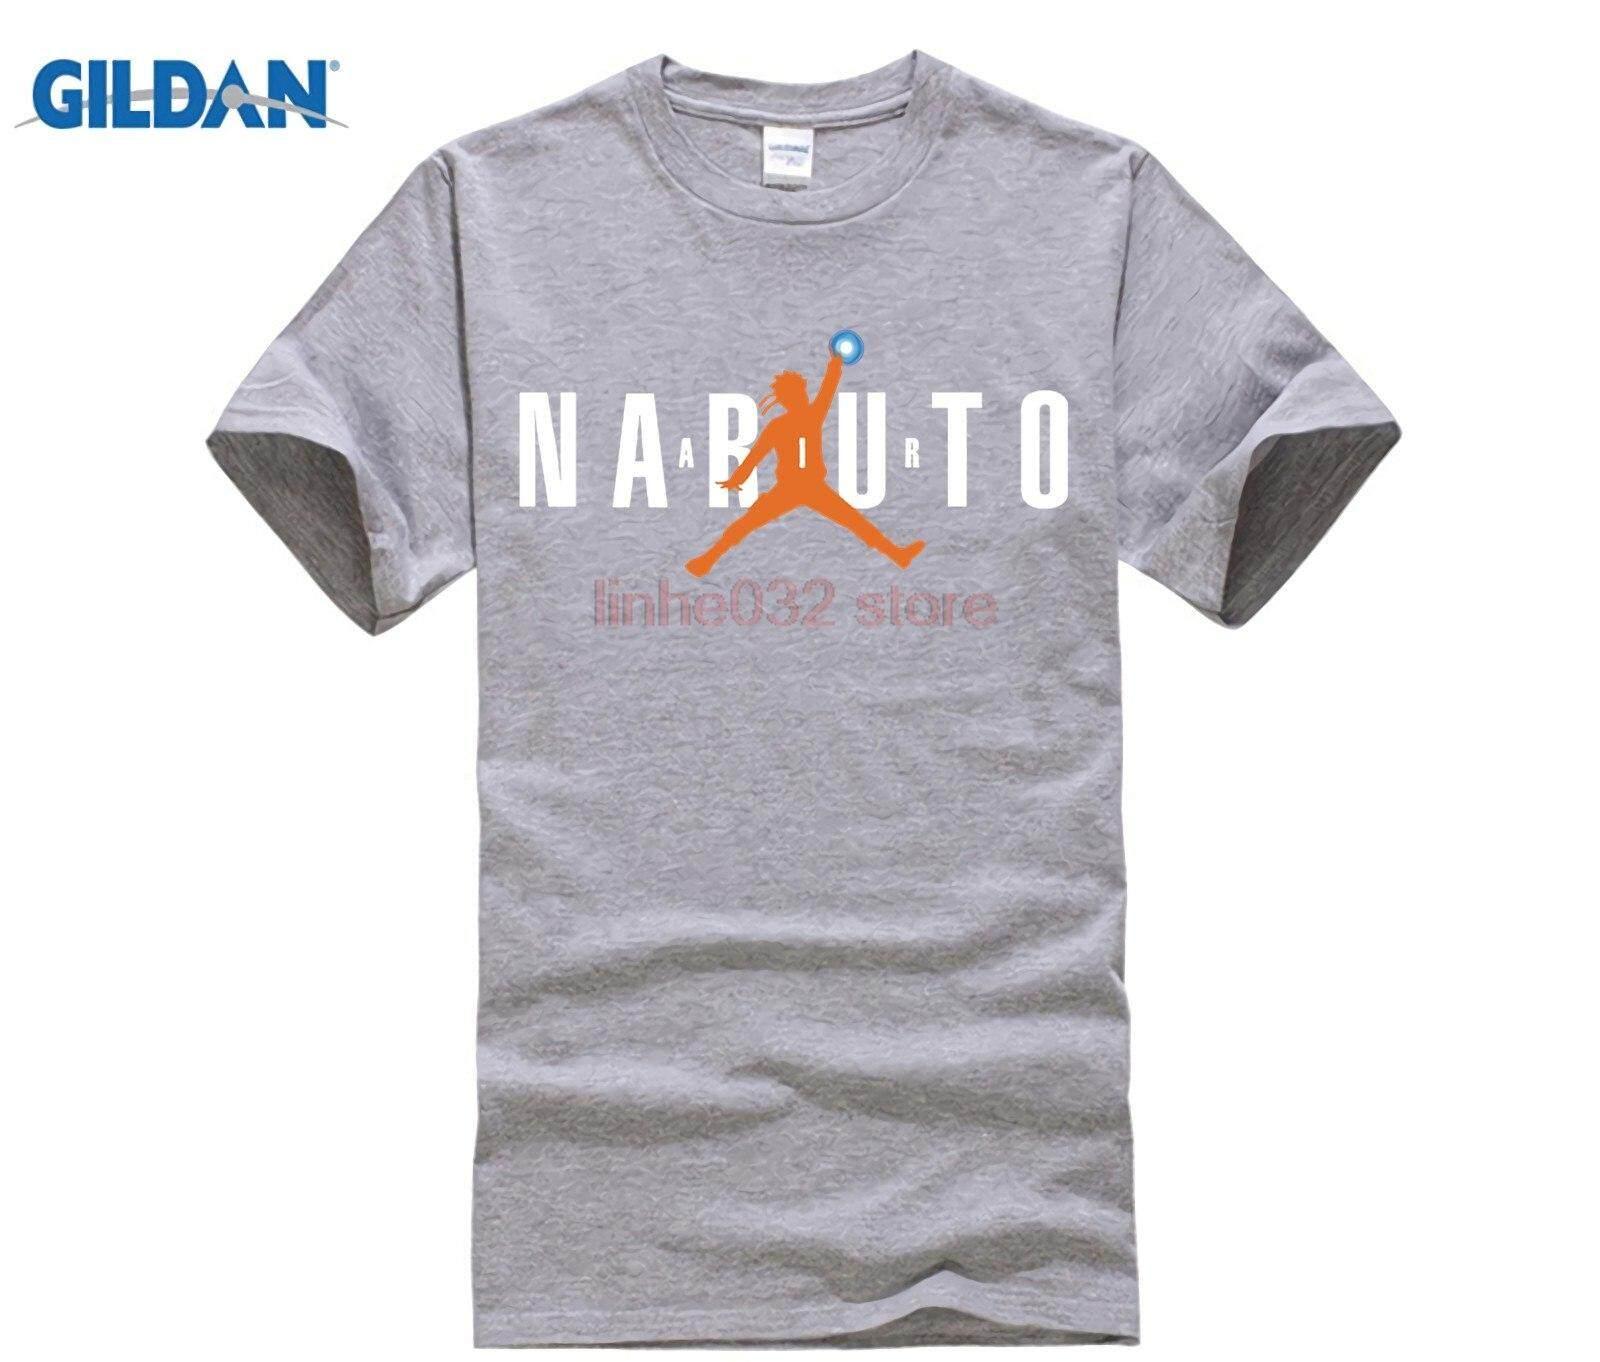 fe62567d7619b ZK 2018 Cool Designer Air Naruto T Shirts Men Round Neck Short Sleeve Anime  Teeshirt design